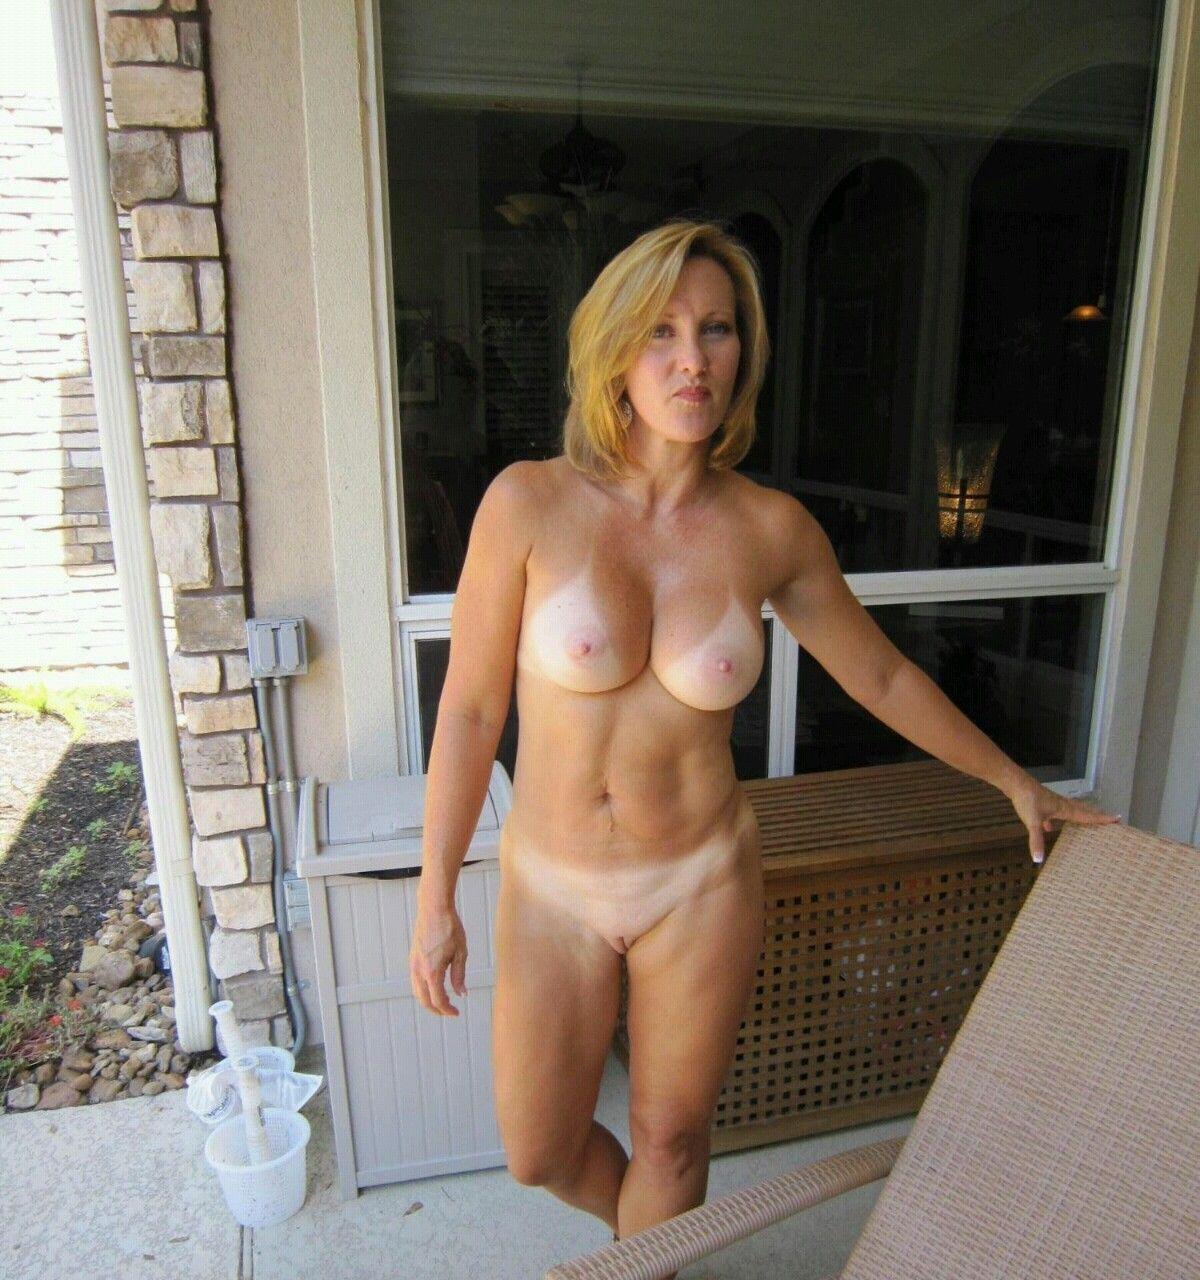 Milf free nude Hot Milf